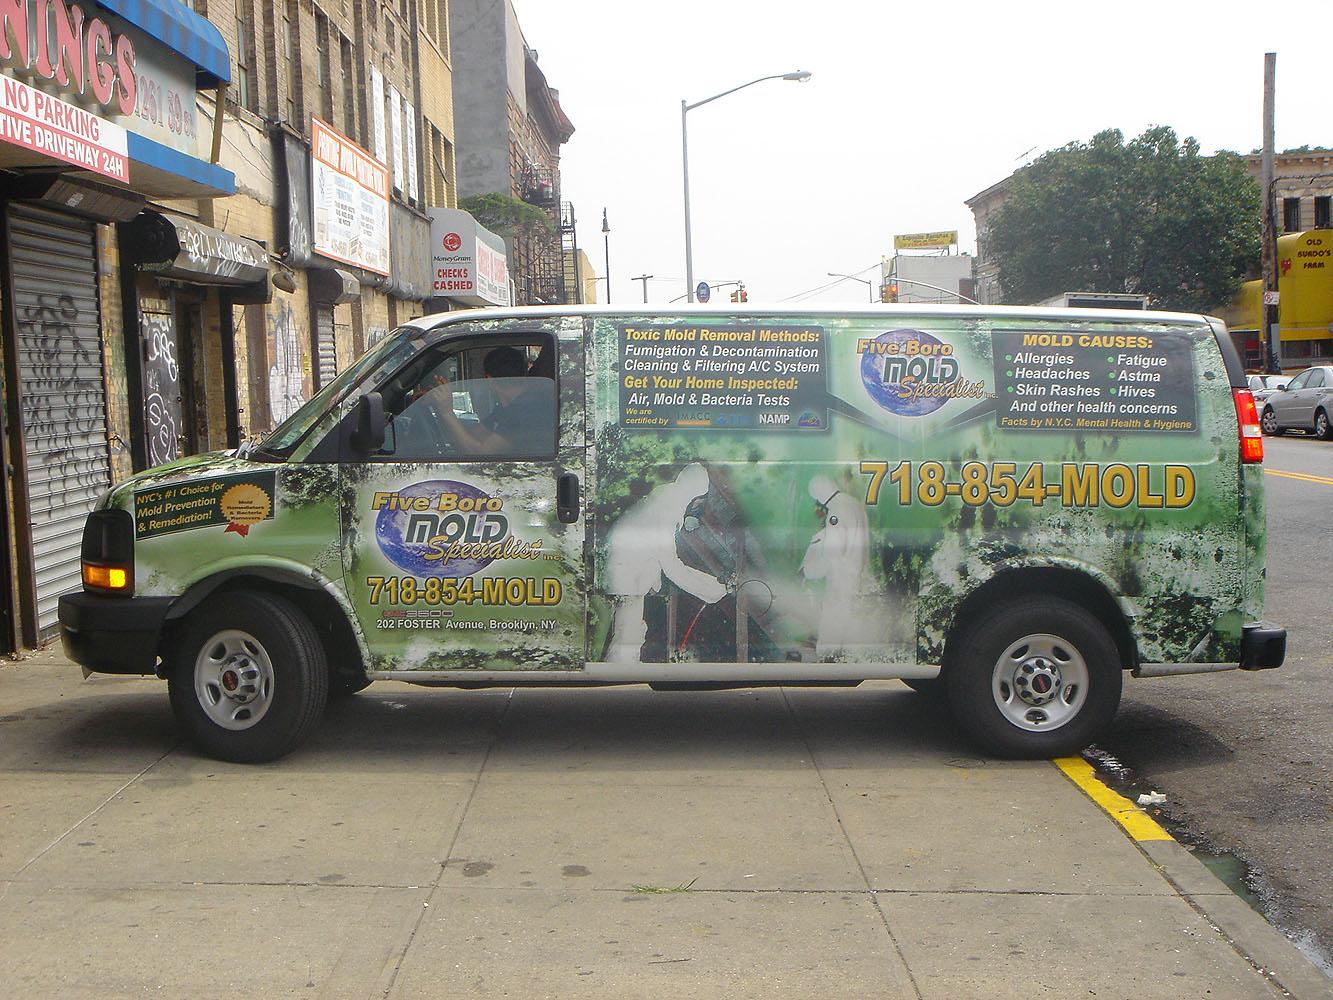 Five Boro Mold Specialist in NYC